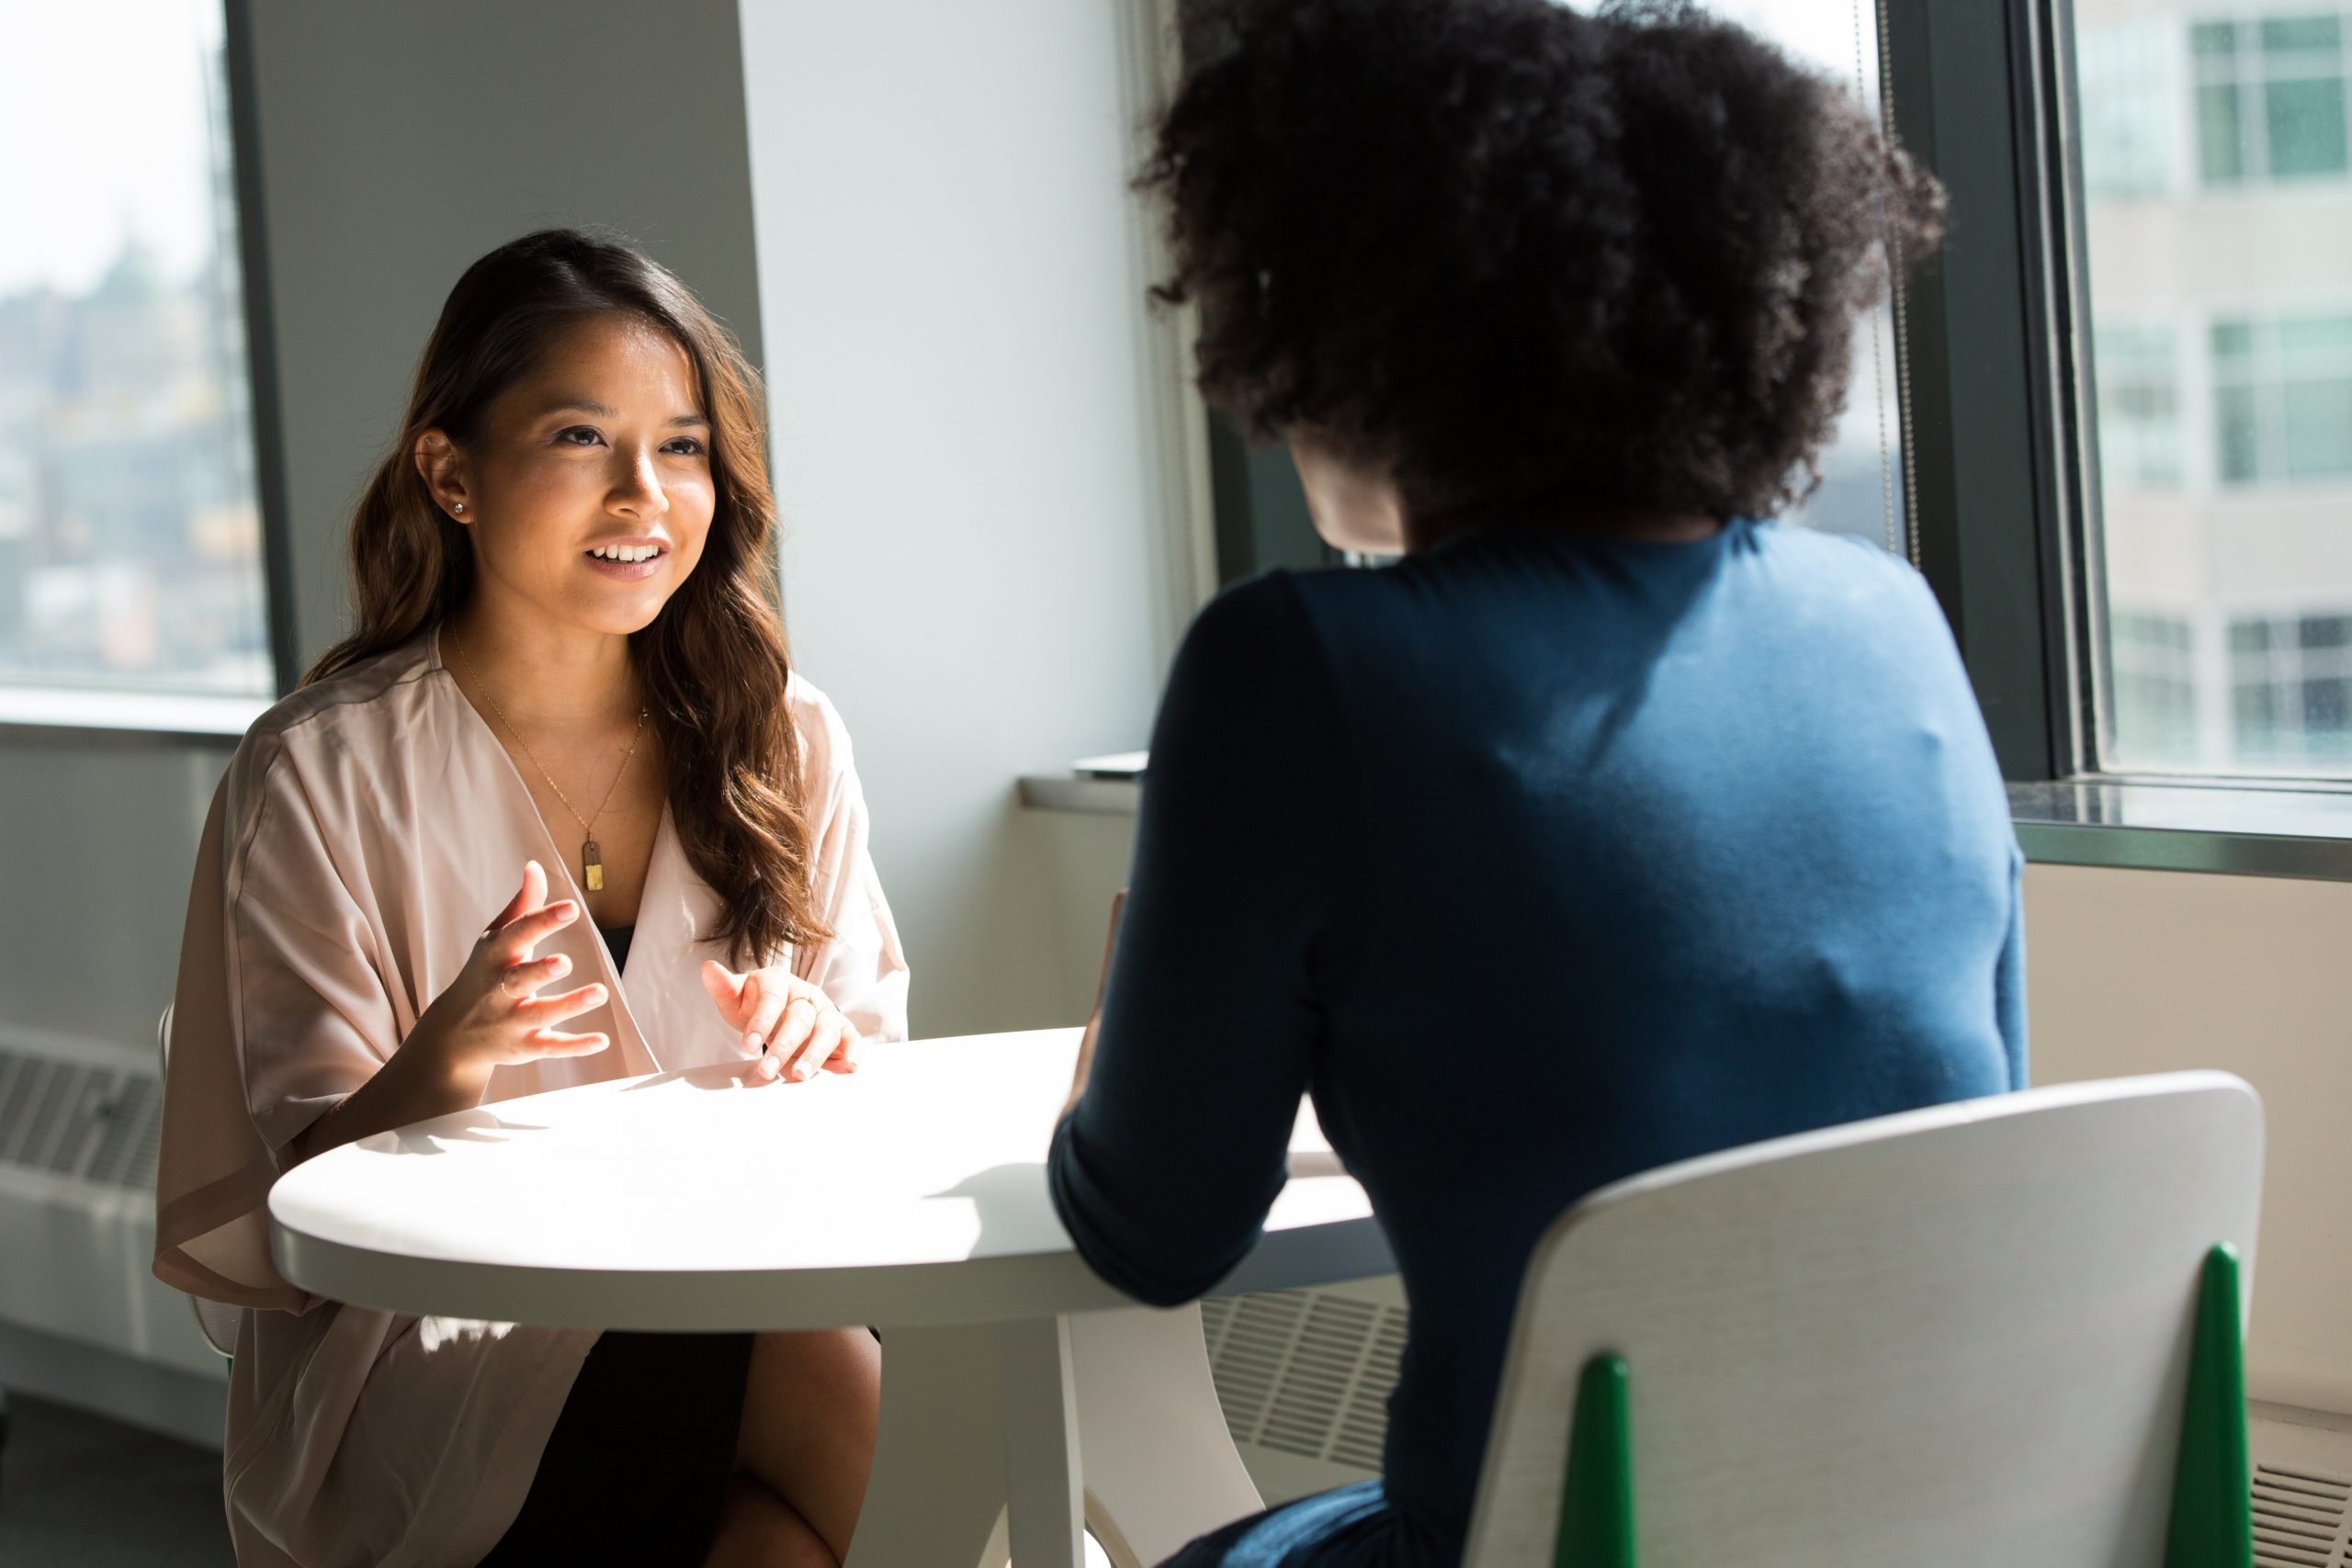 Starting a New Role? Assess Organizational Culture